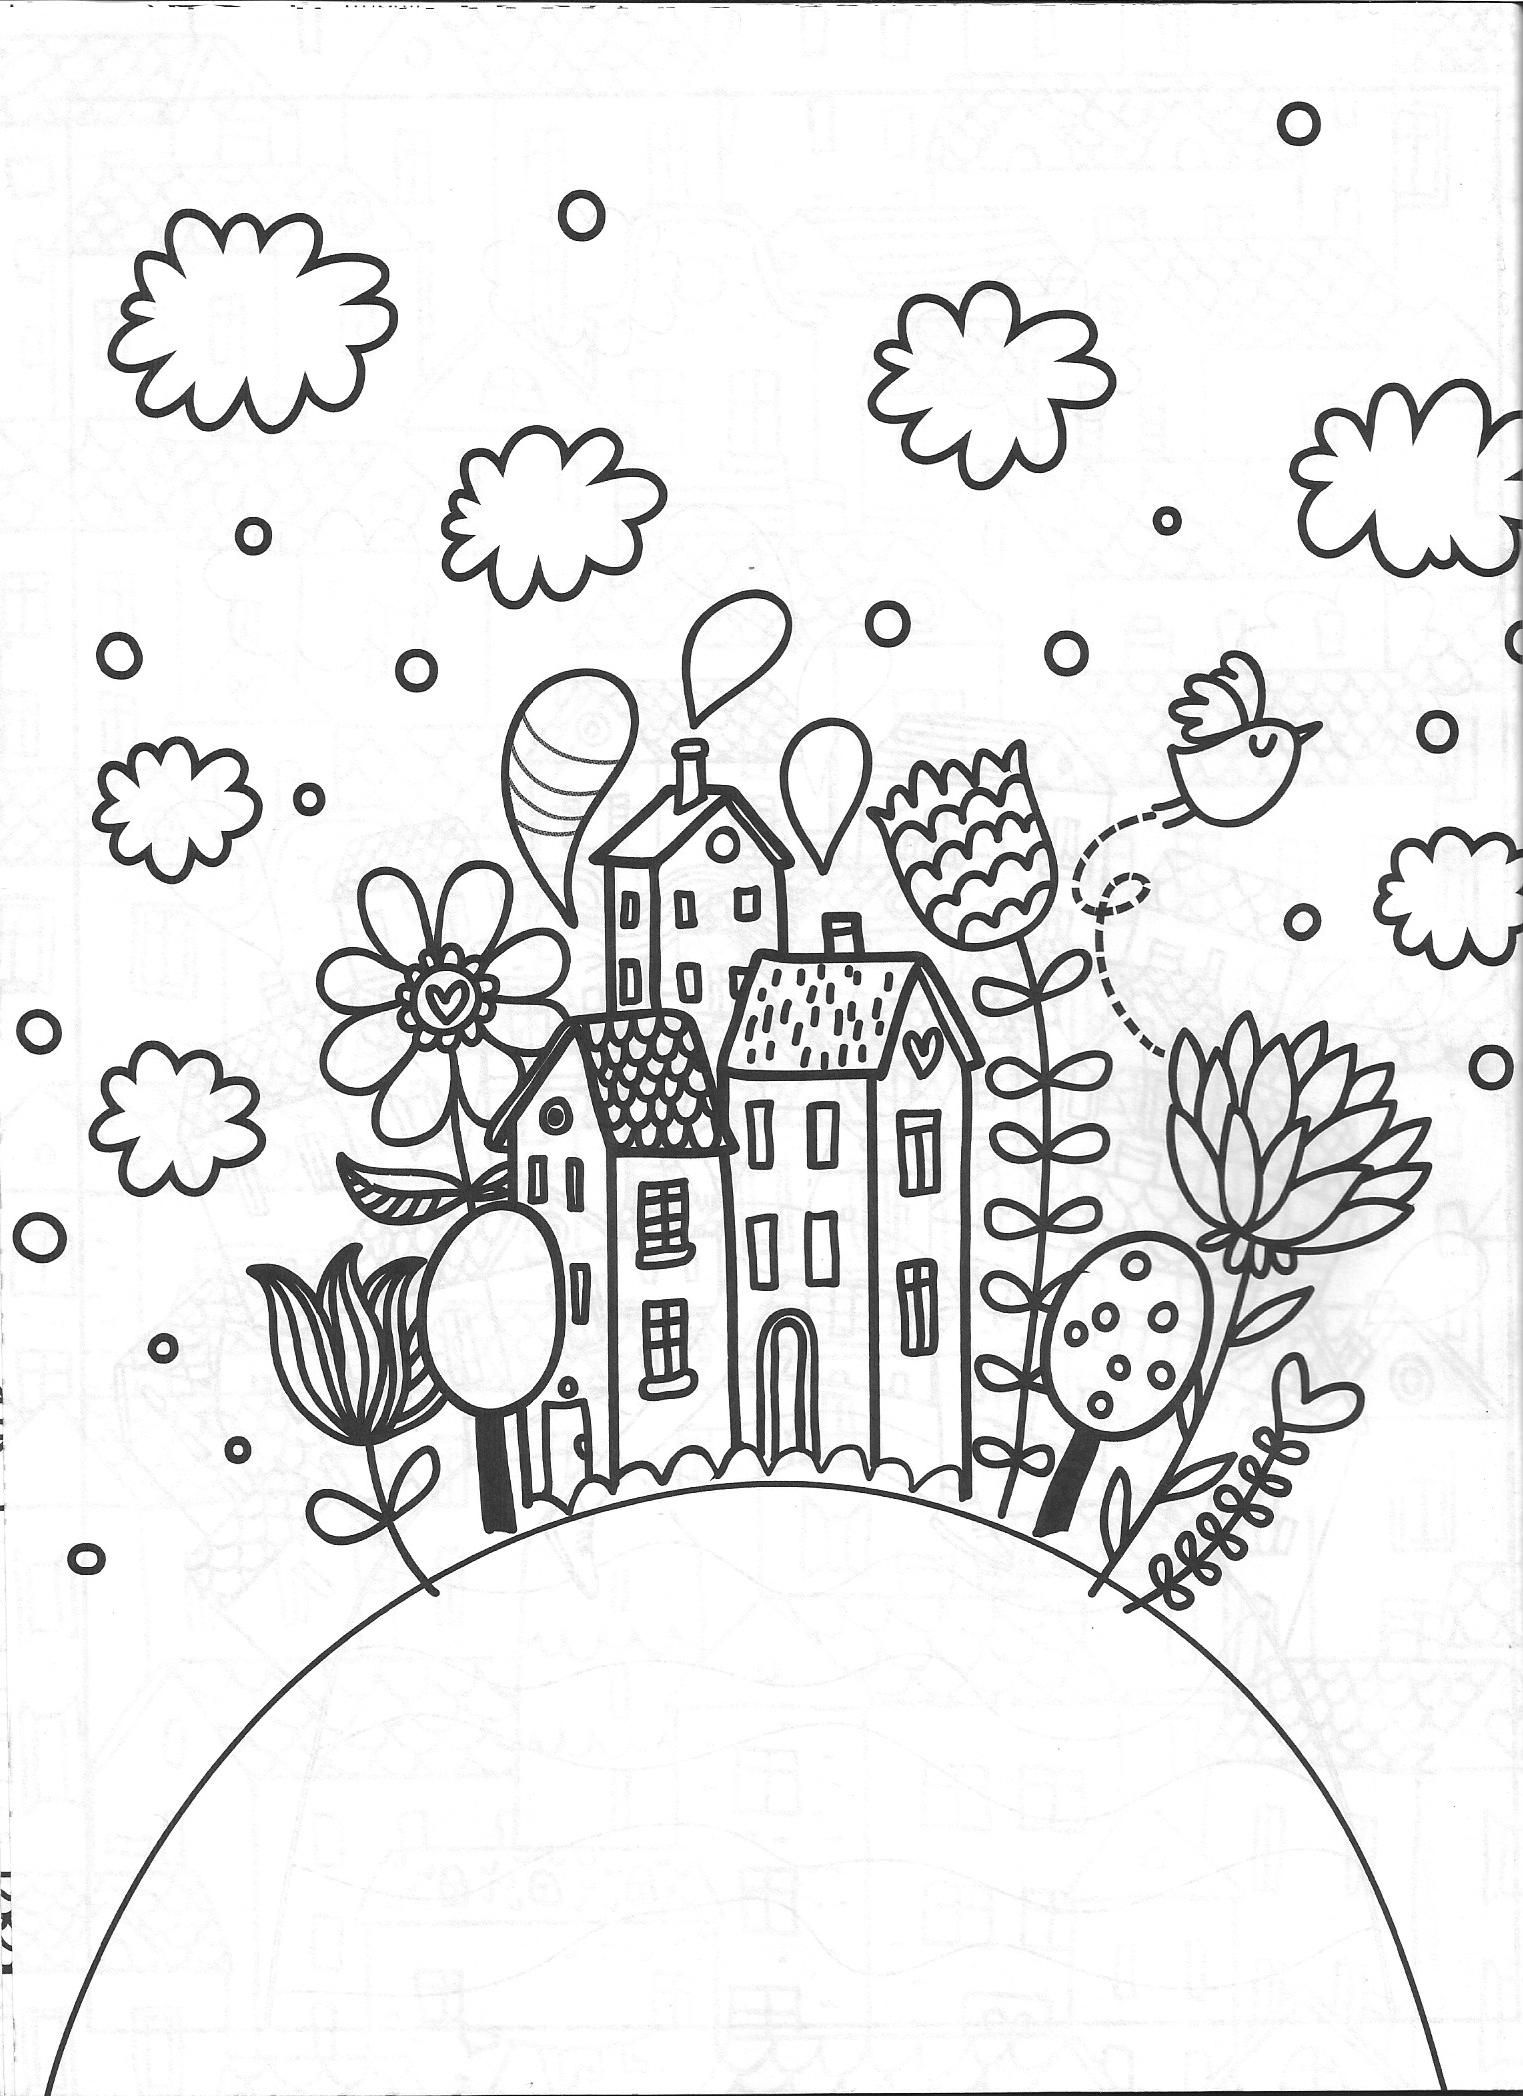 Vida Simples Cidade Dos Sonhos Embroidery Patterns Coloring